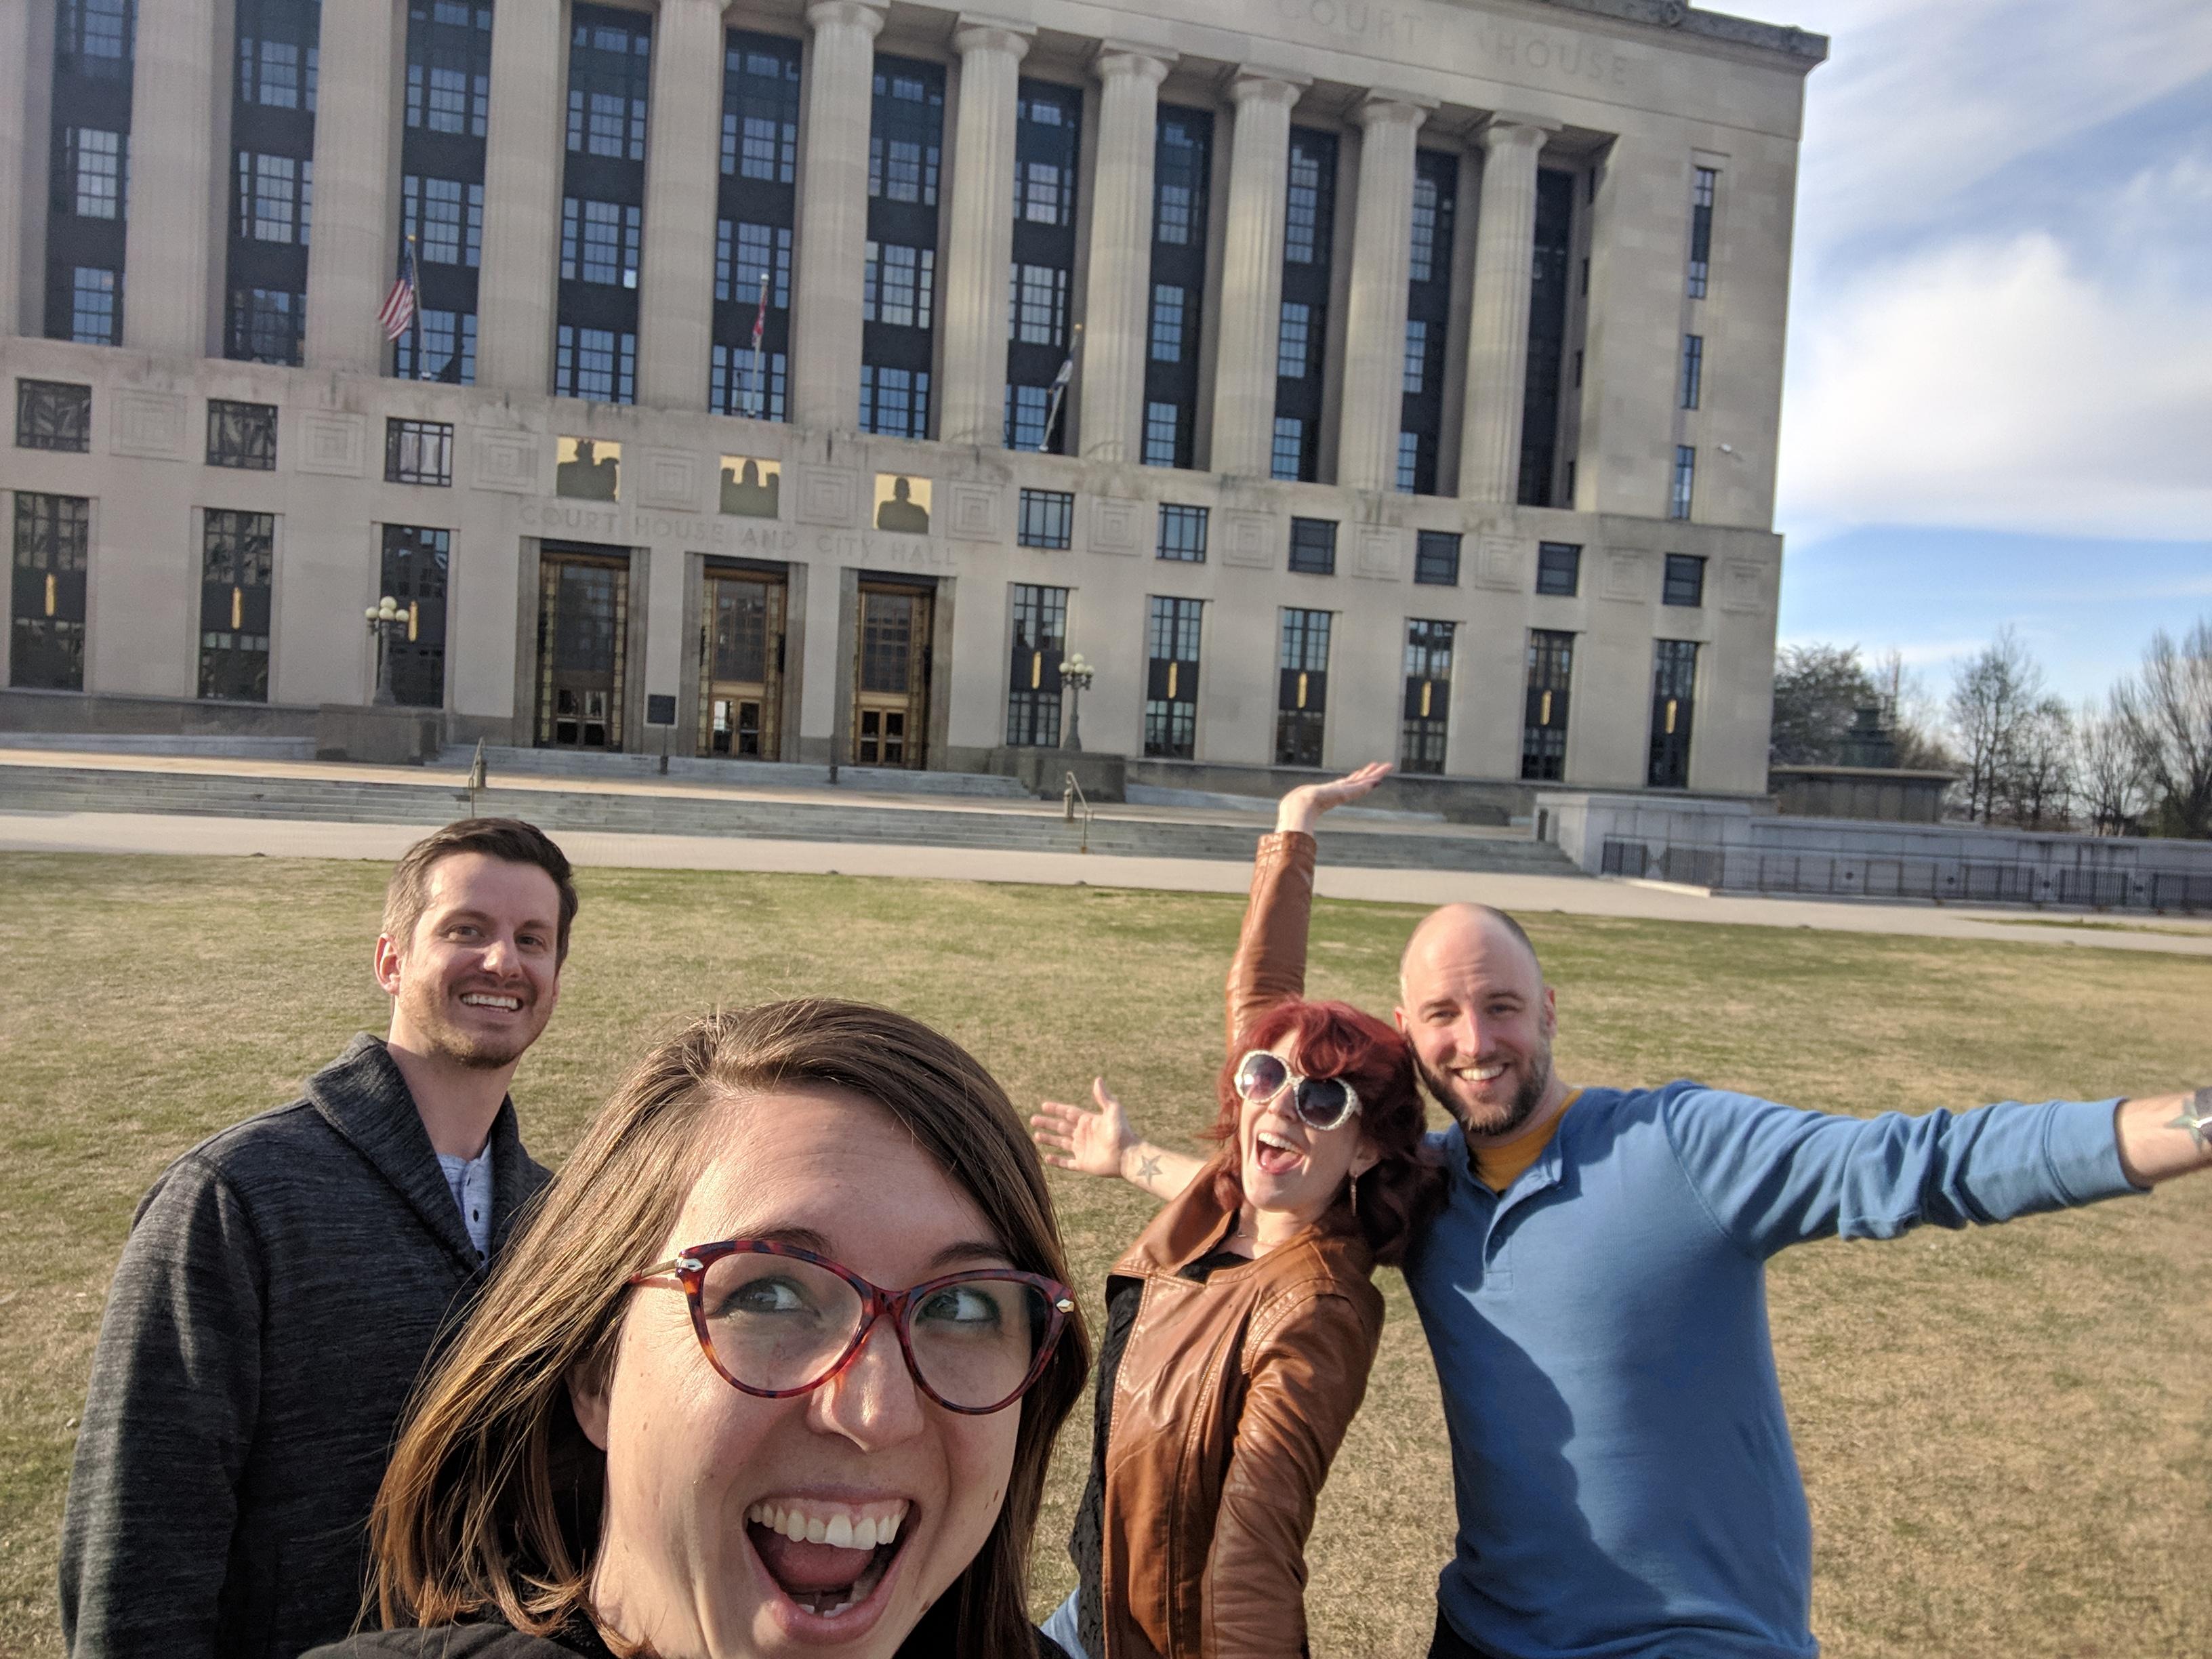 City Hall Selfie in Nashville